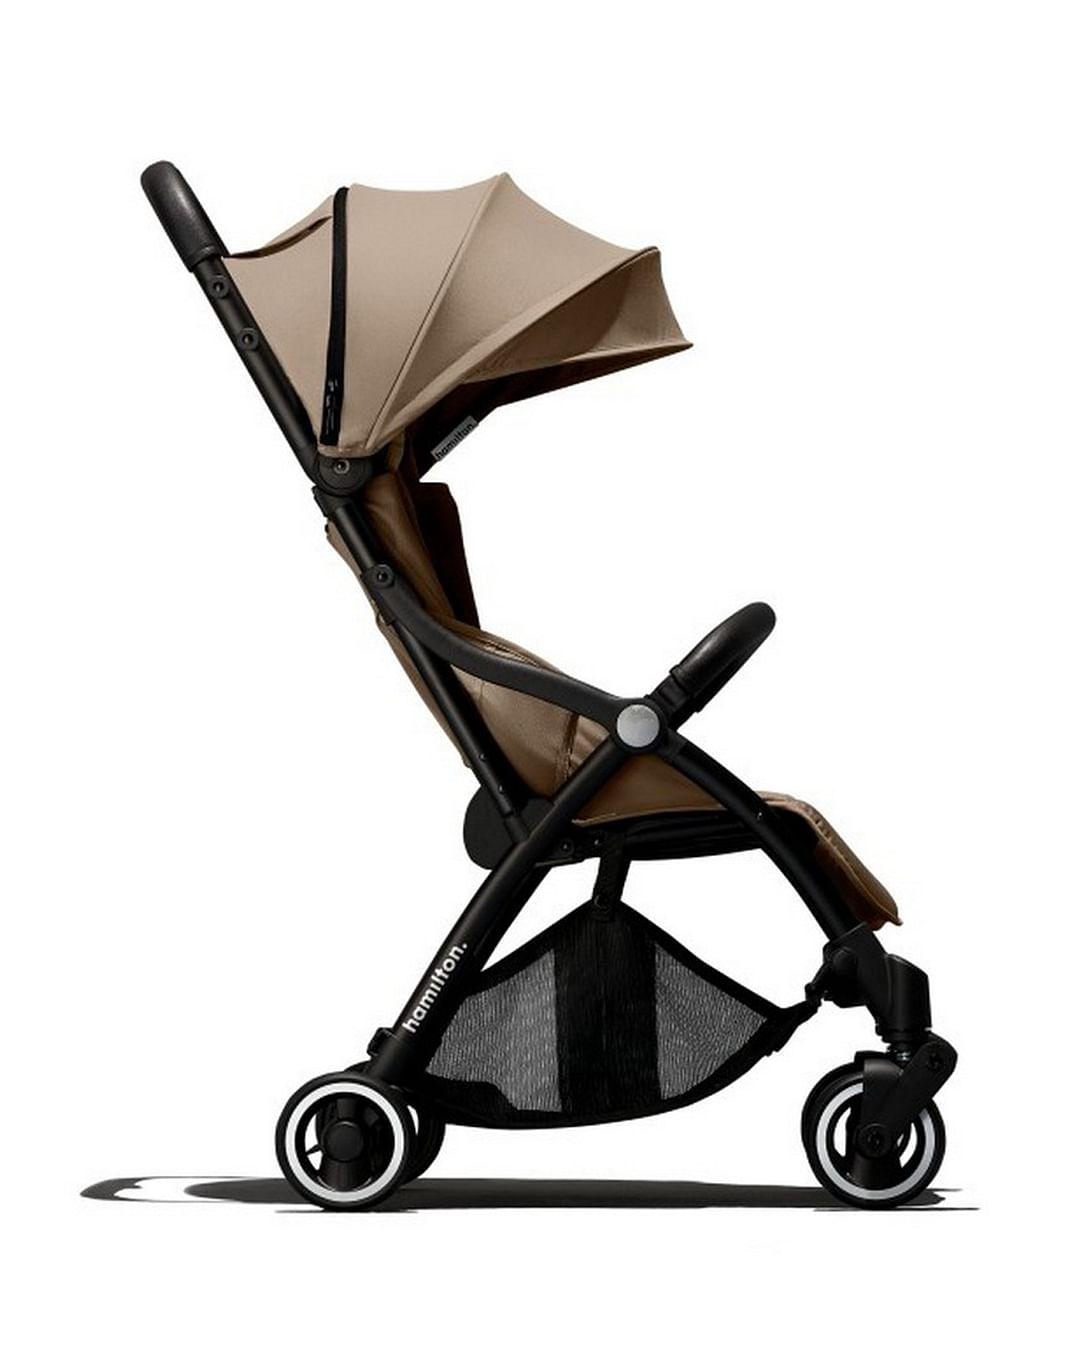 Hamilton One Prime X1 Baby Stroller